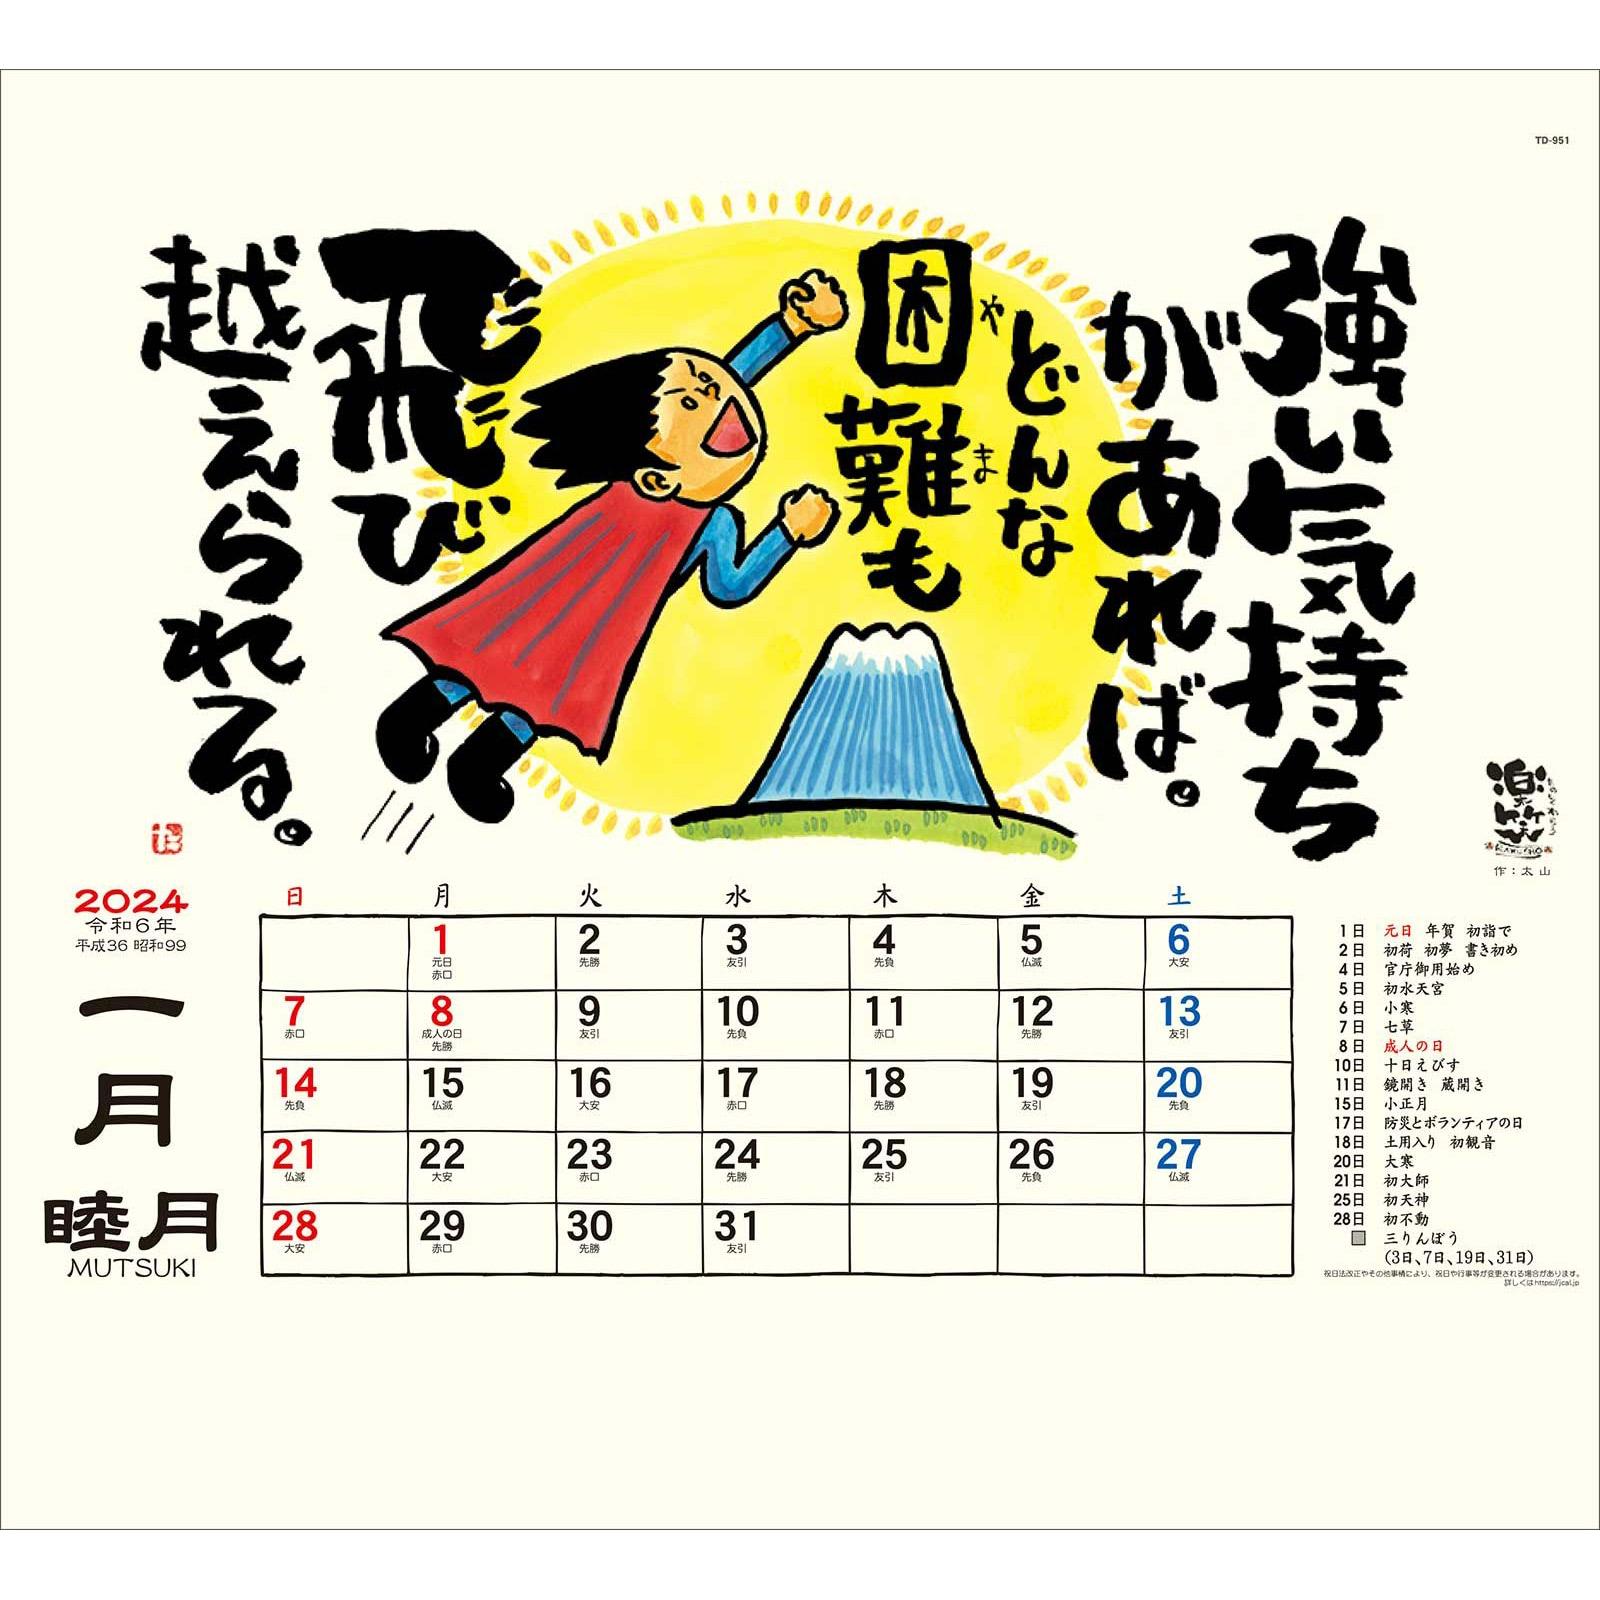 TD-30951(2022年版)<br>楽笑<br>~笑顔になれる書画ごよみ~